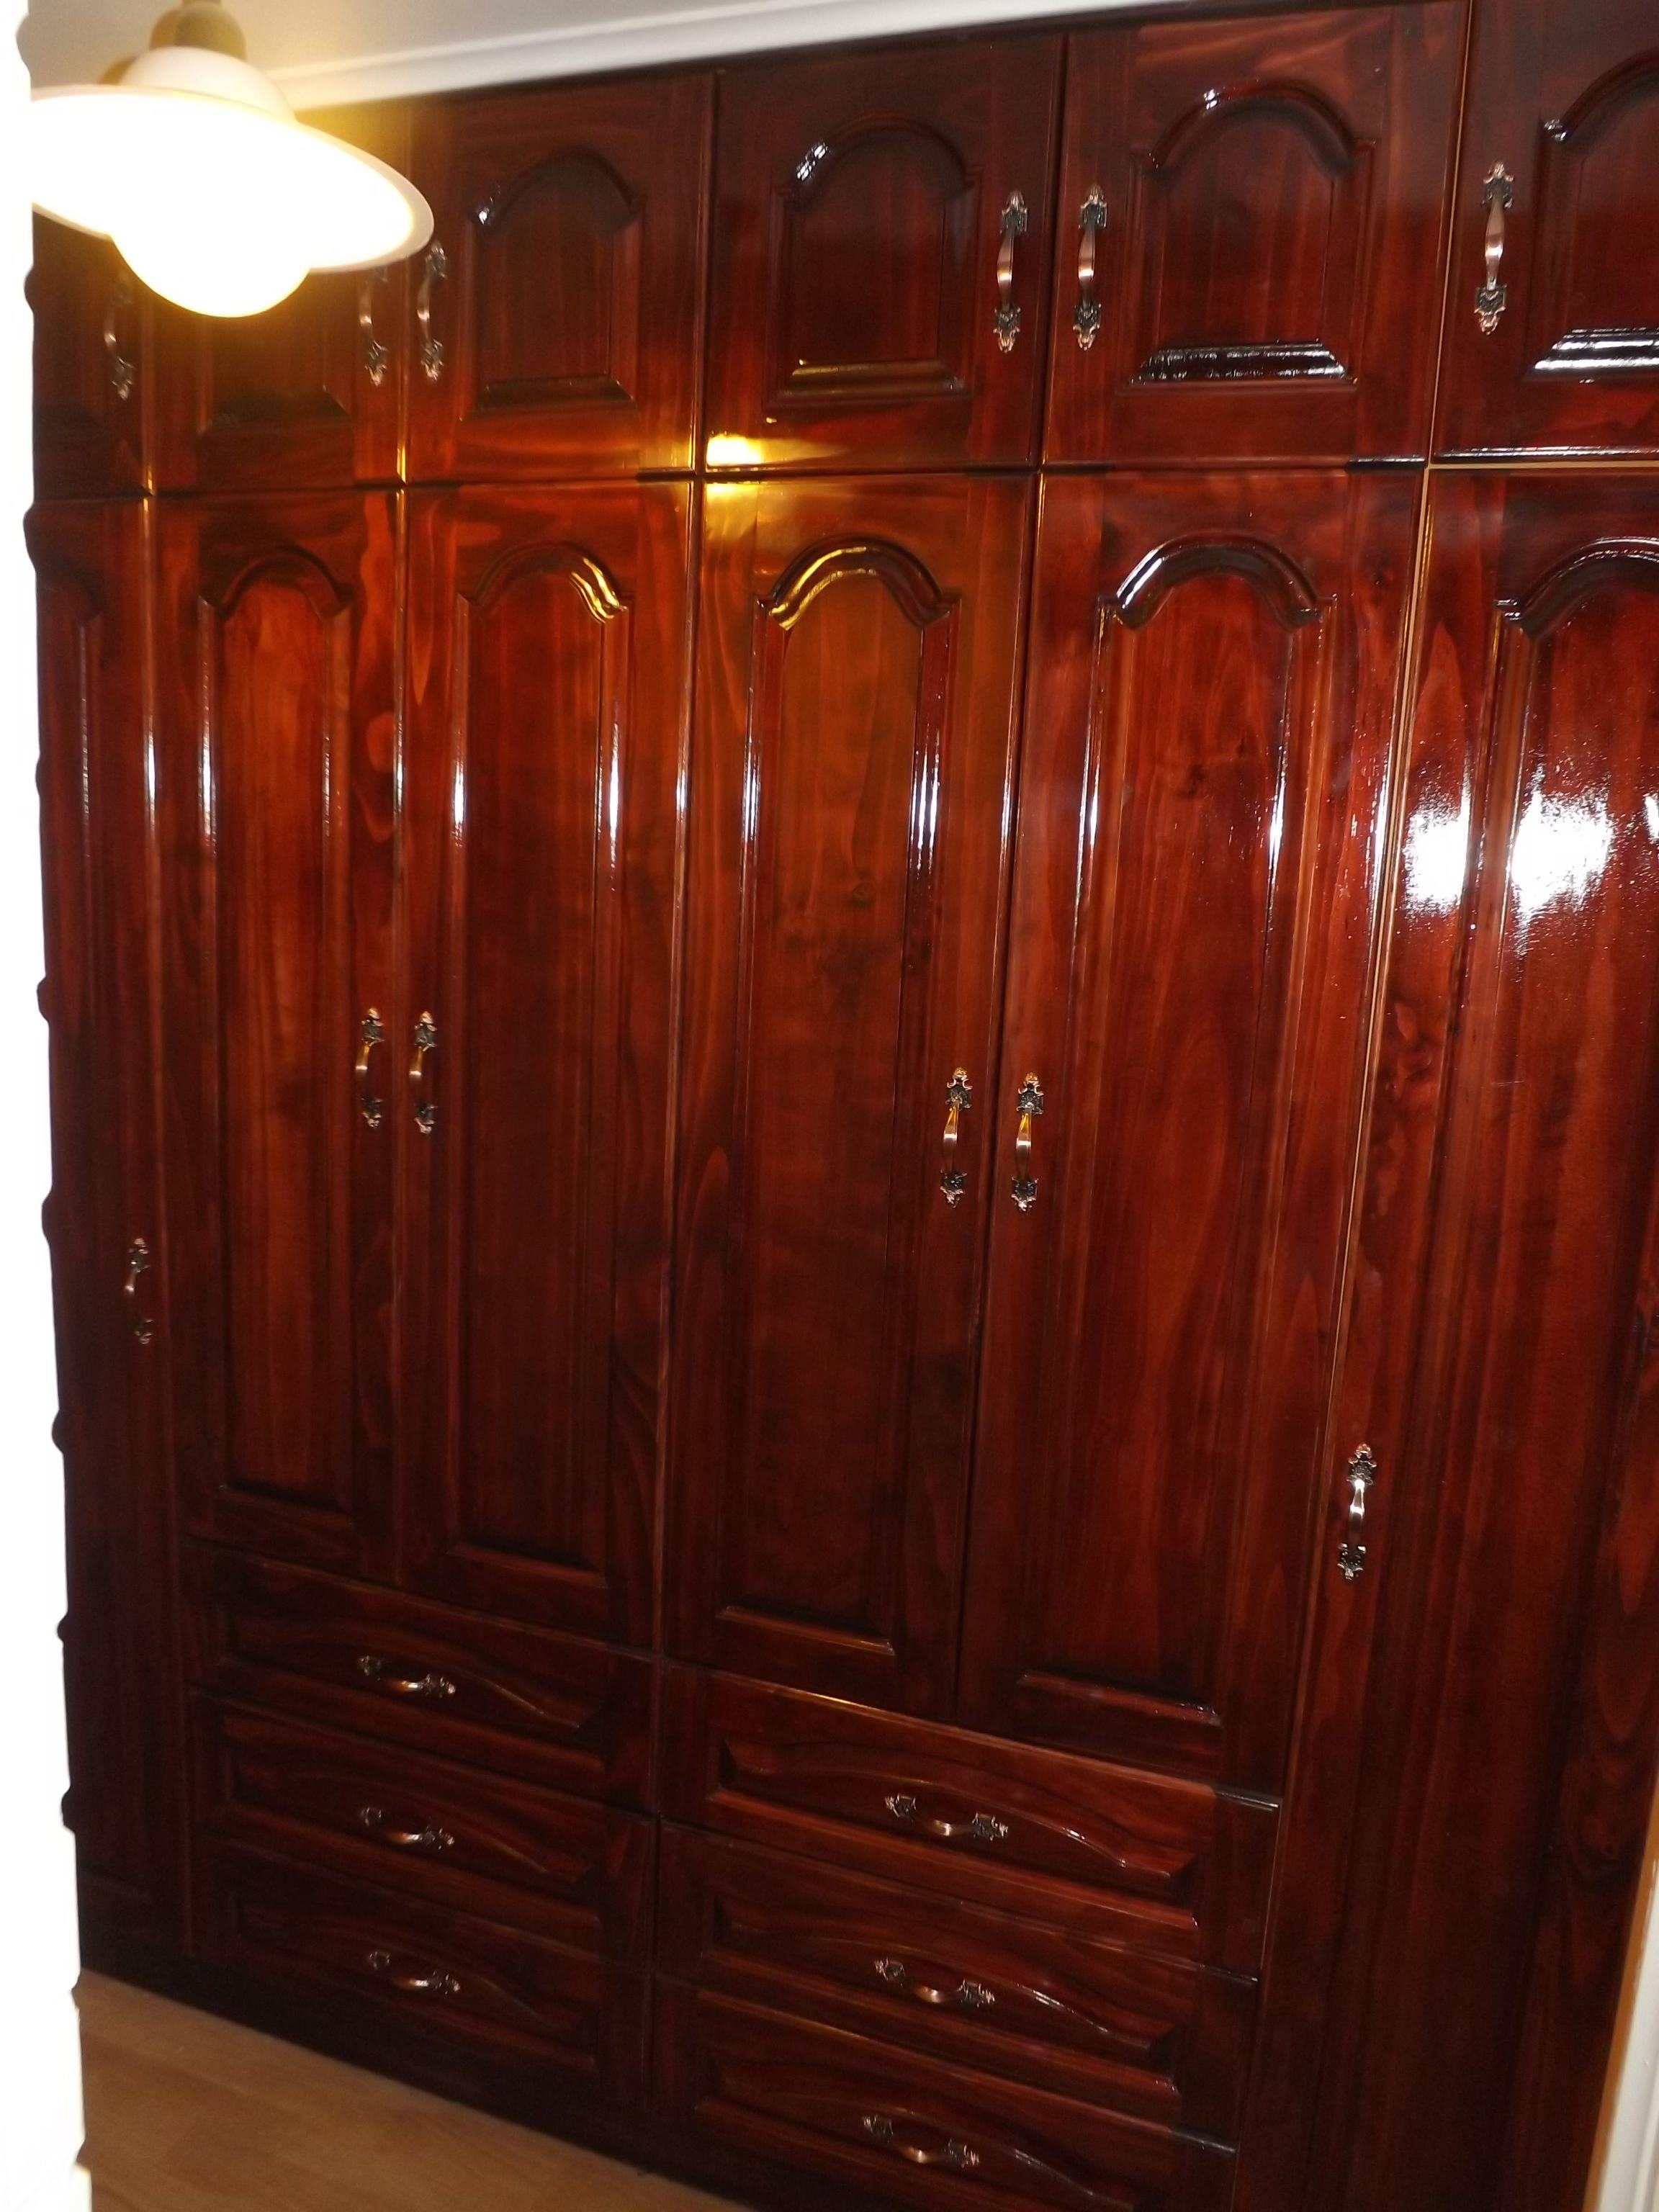 Closet Fabricado En Madera De Pino Radiata Con Terminacion  # Muebles Ricardo Montes